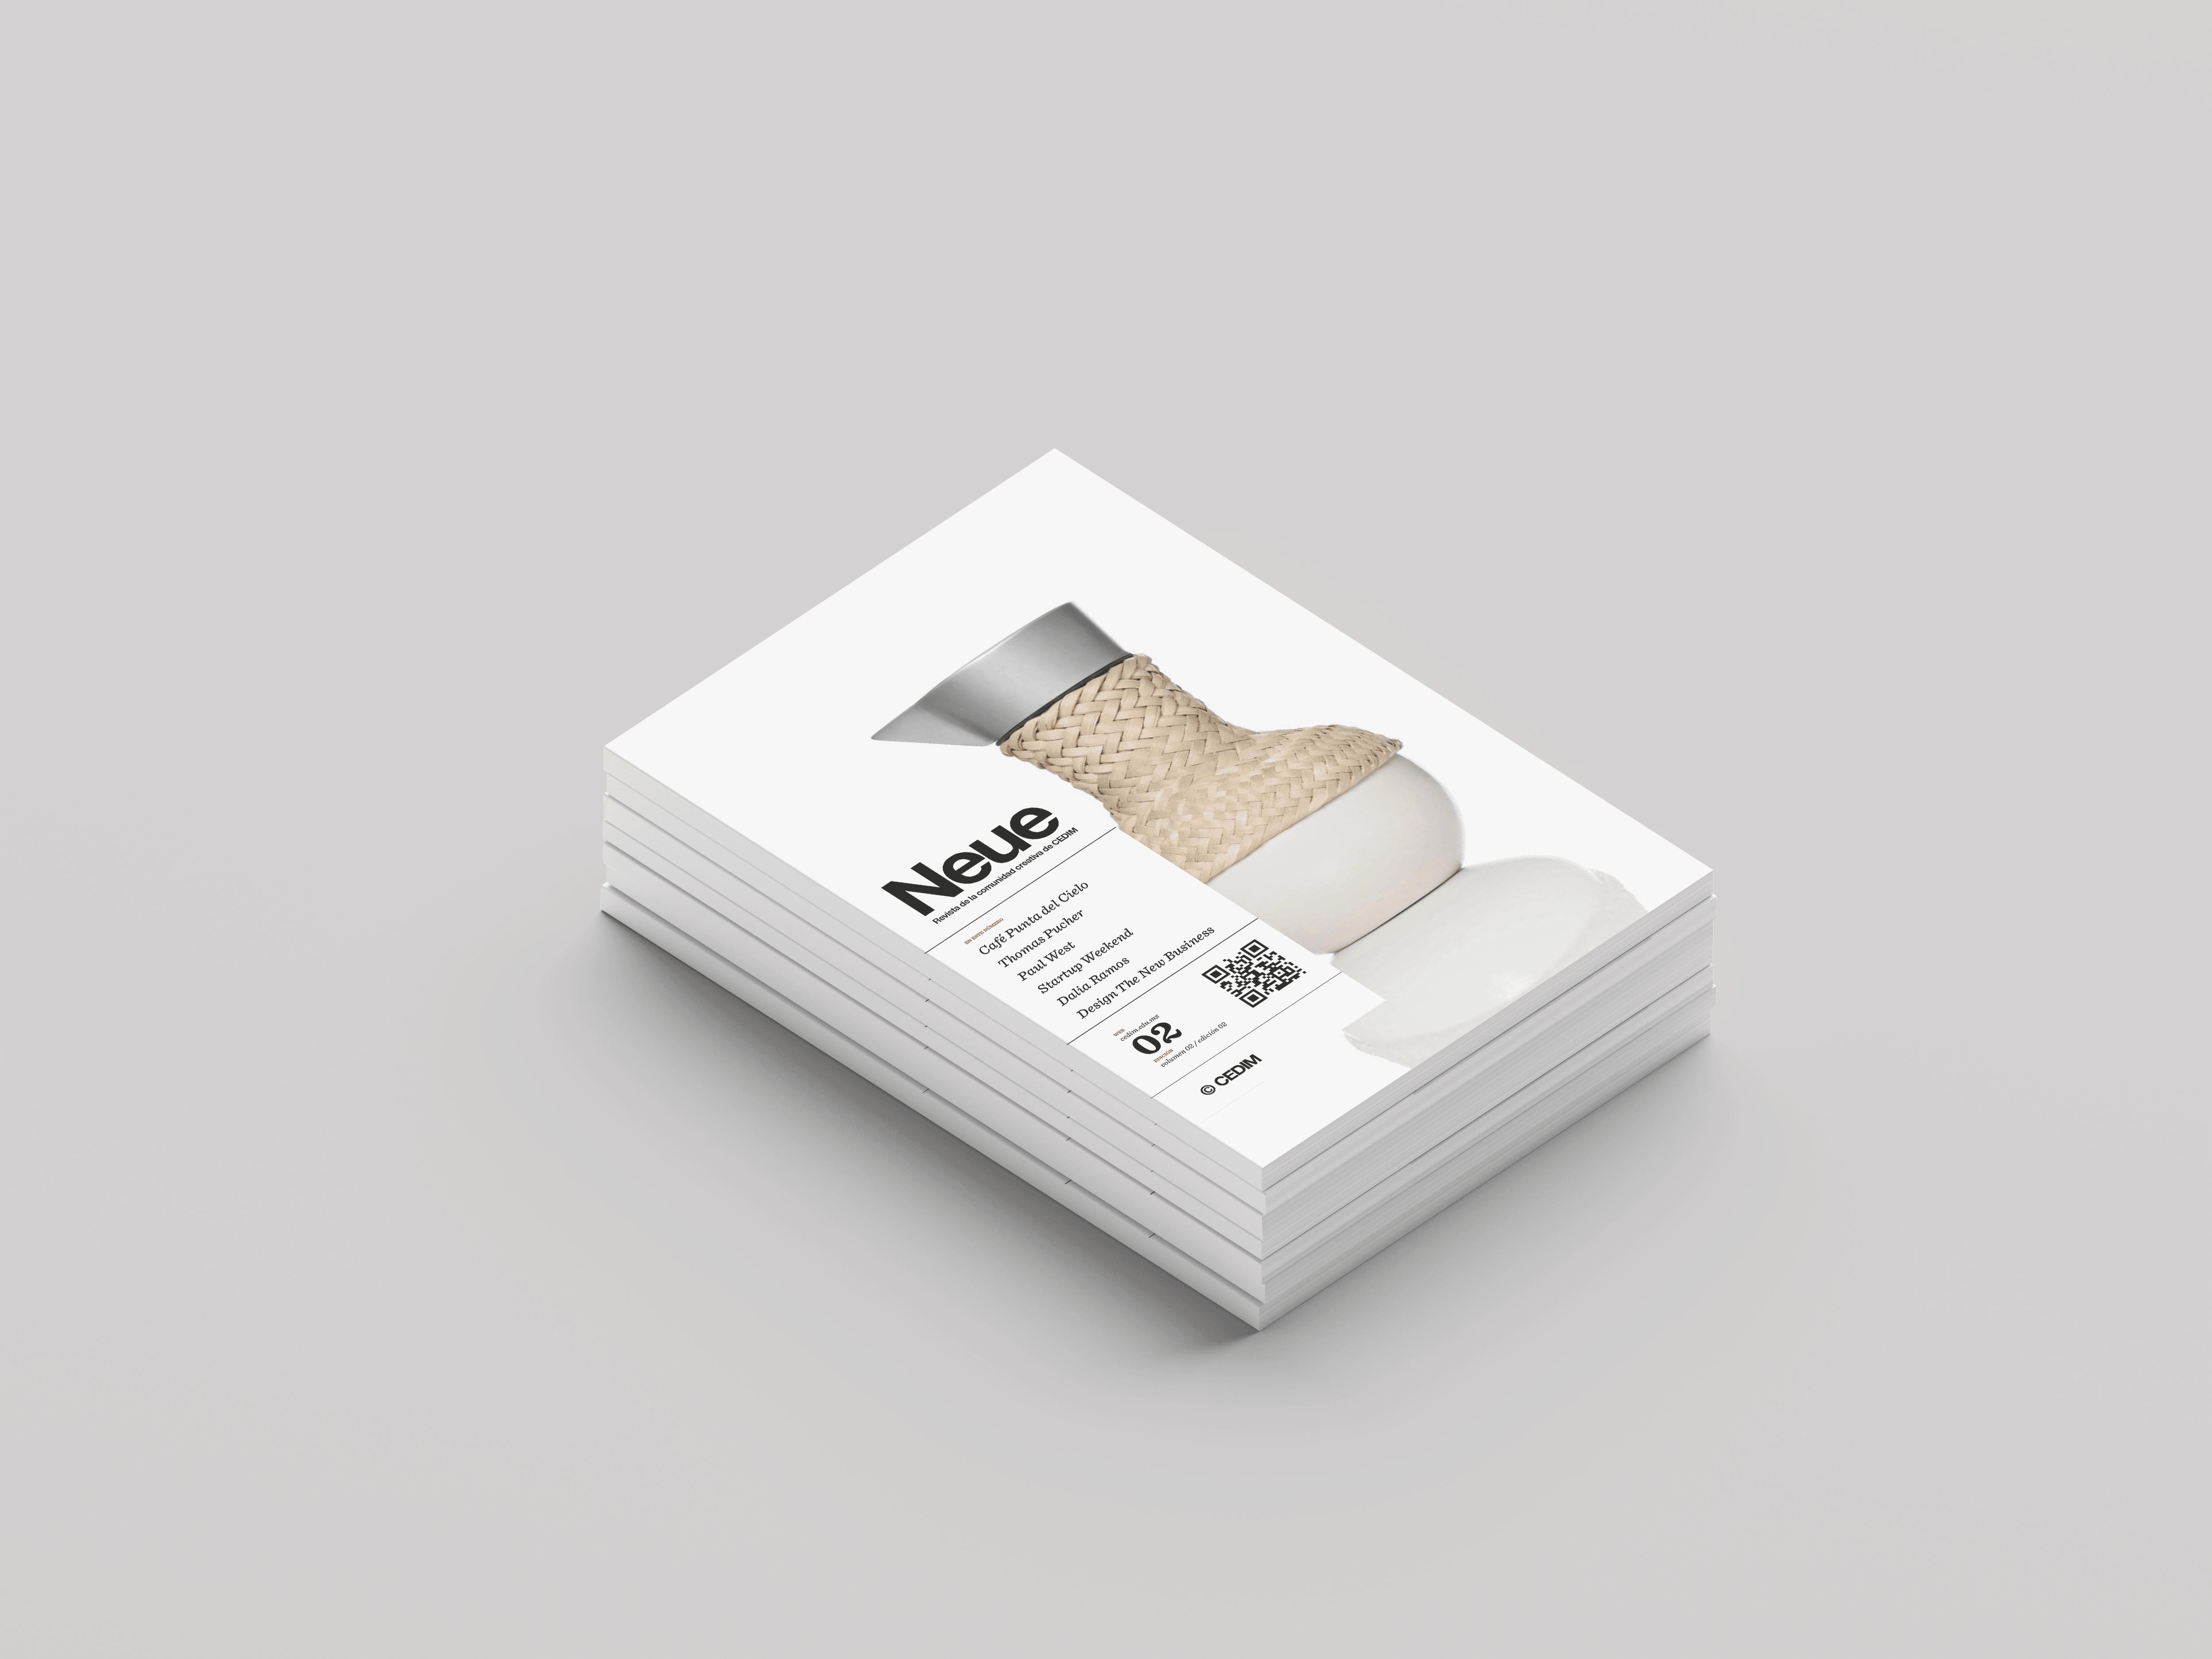 baner-neue02-magazine-cedim-yoenpaperland-compressor